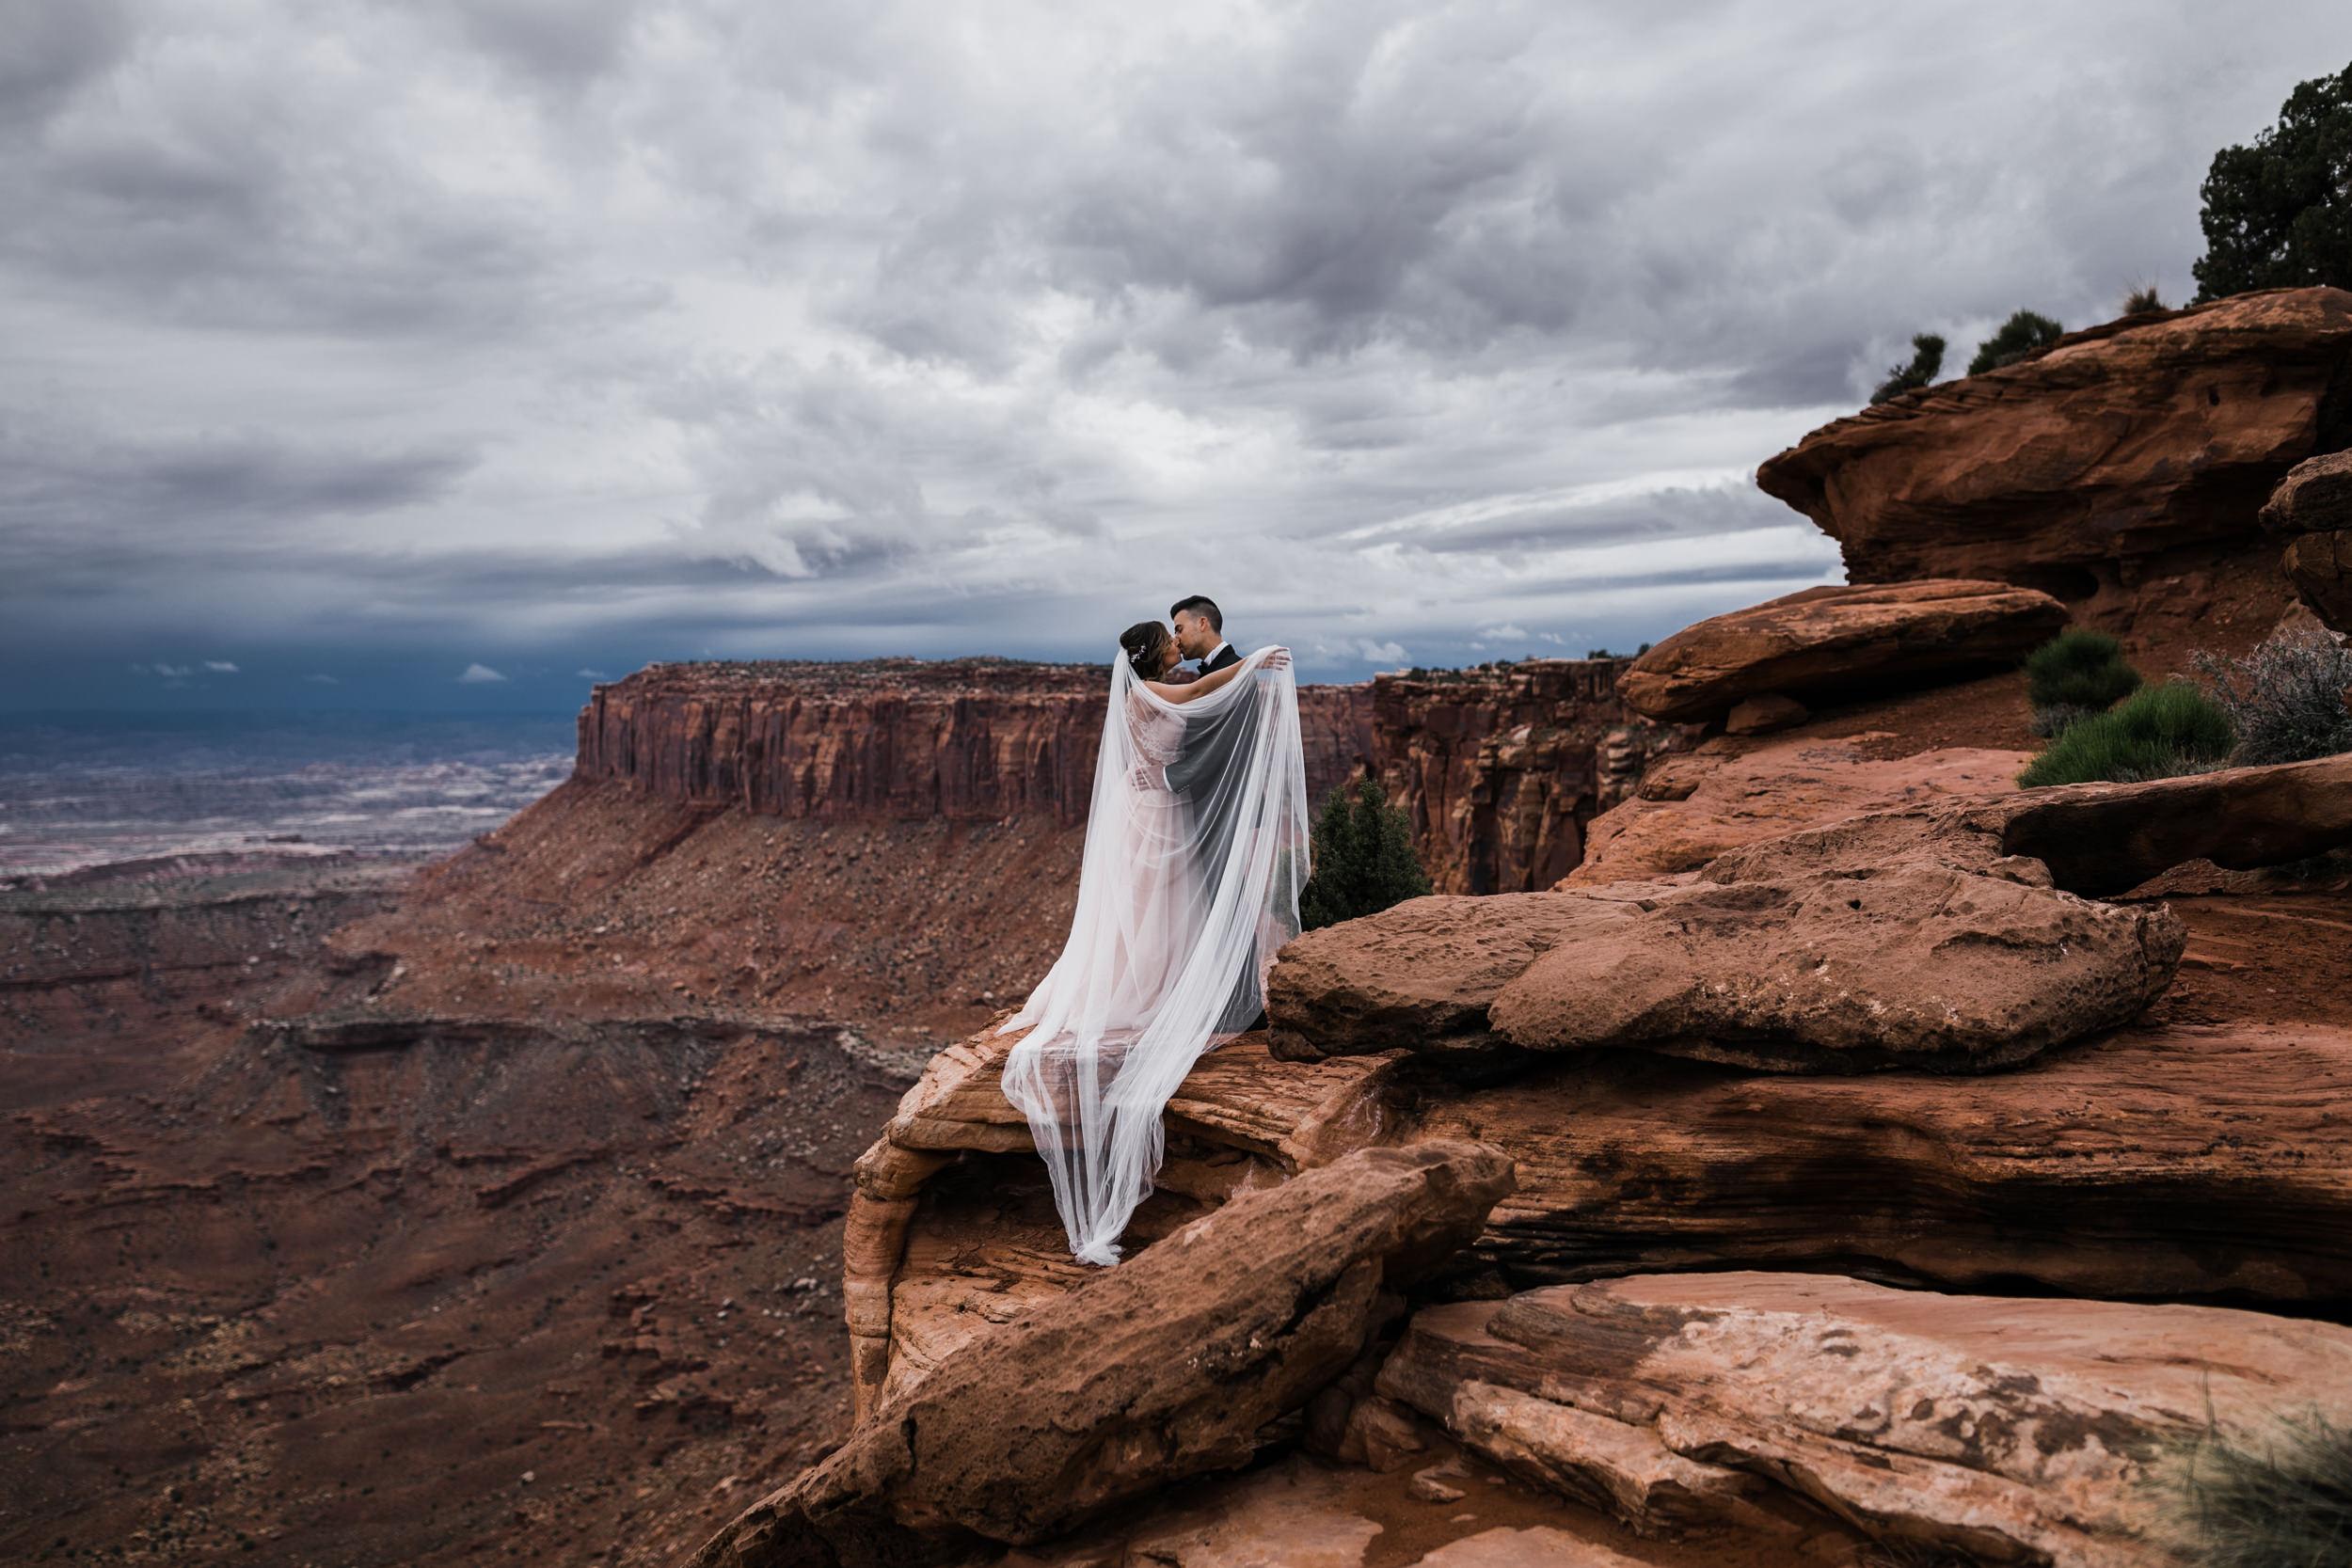 Hearnes-Elopement-Photography-Canyonlands-National-Park-Moab-Wedding-1.jpg